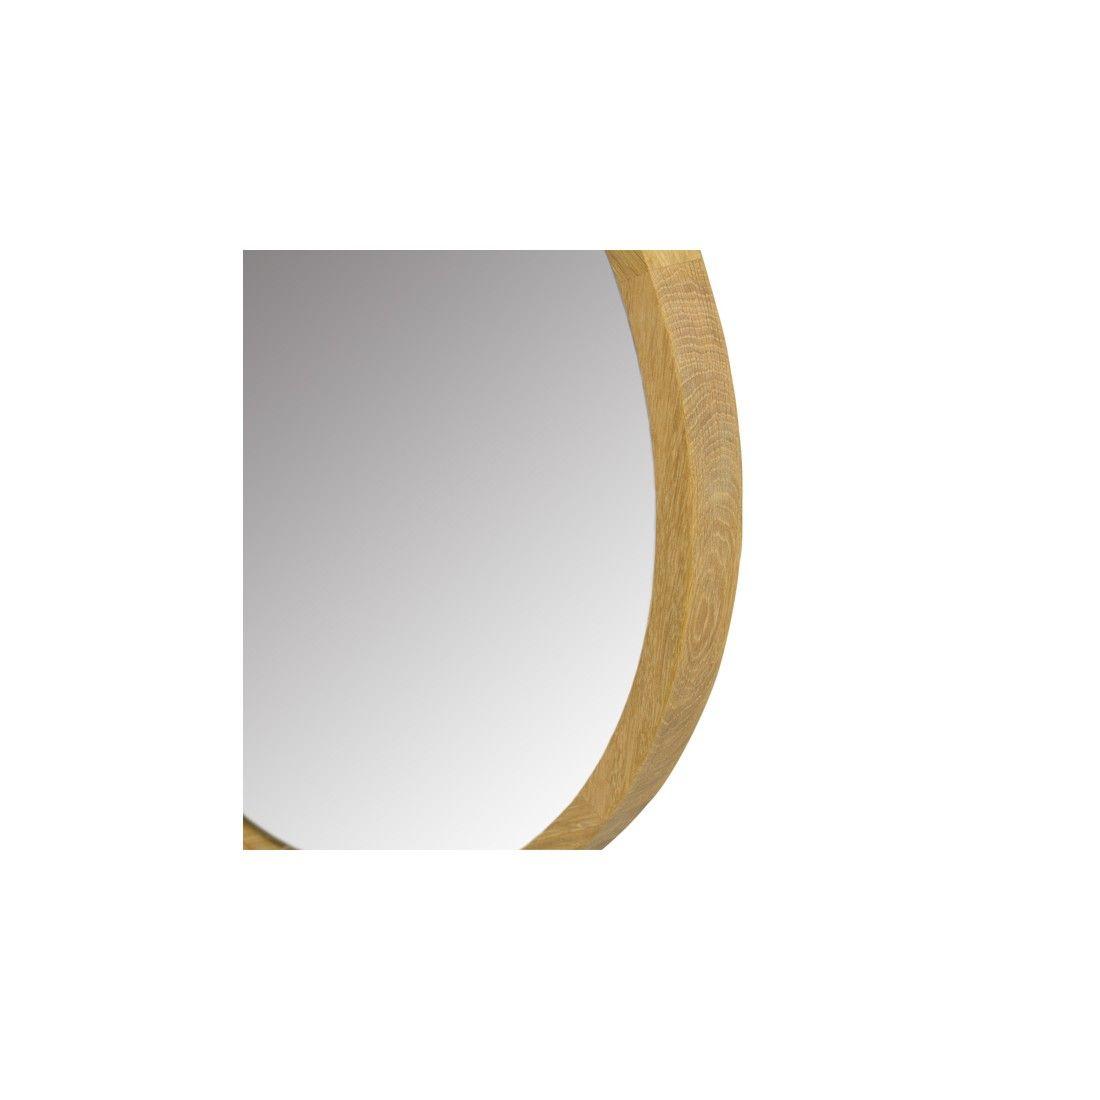 Miroir rond en teck massif, diamètre 50 ou 80 cm